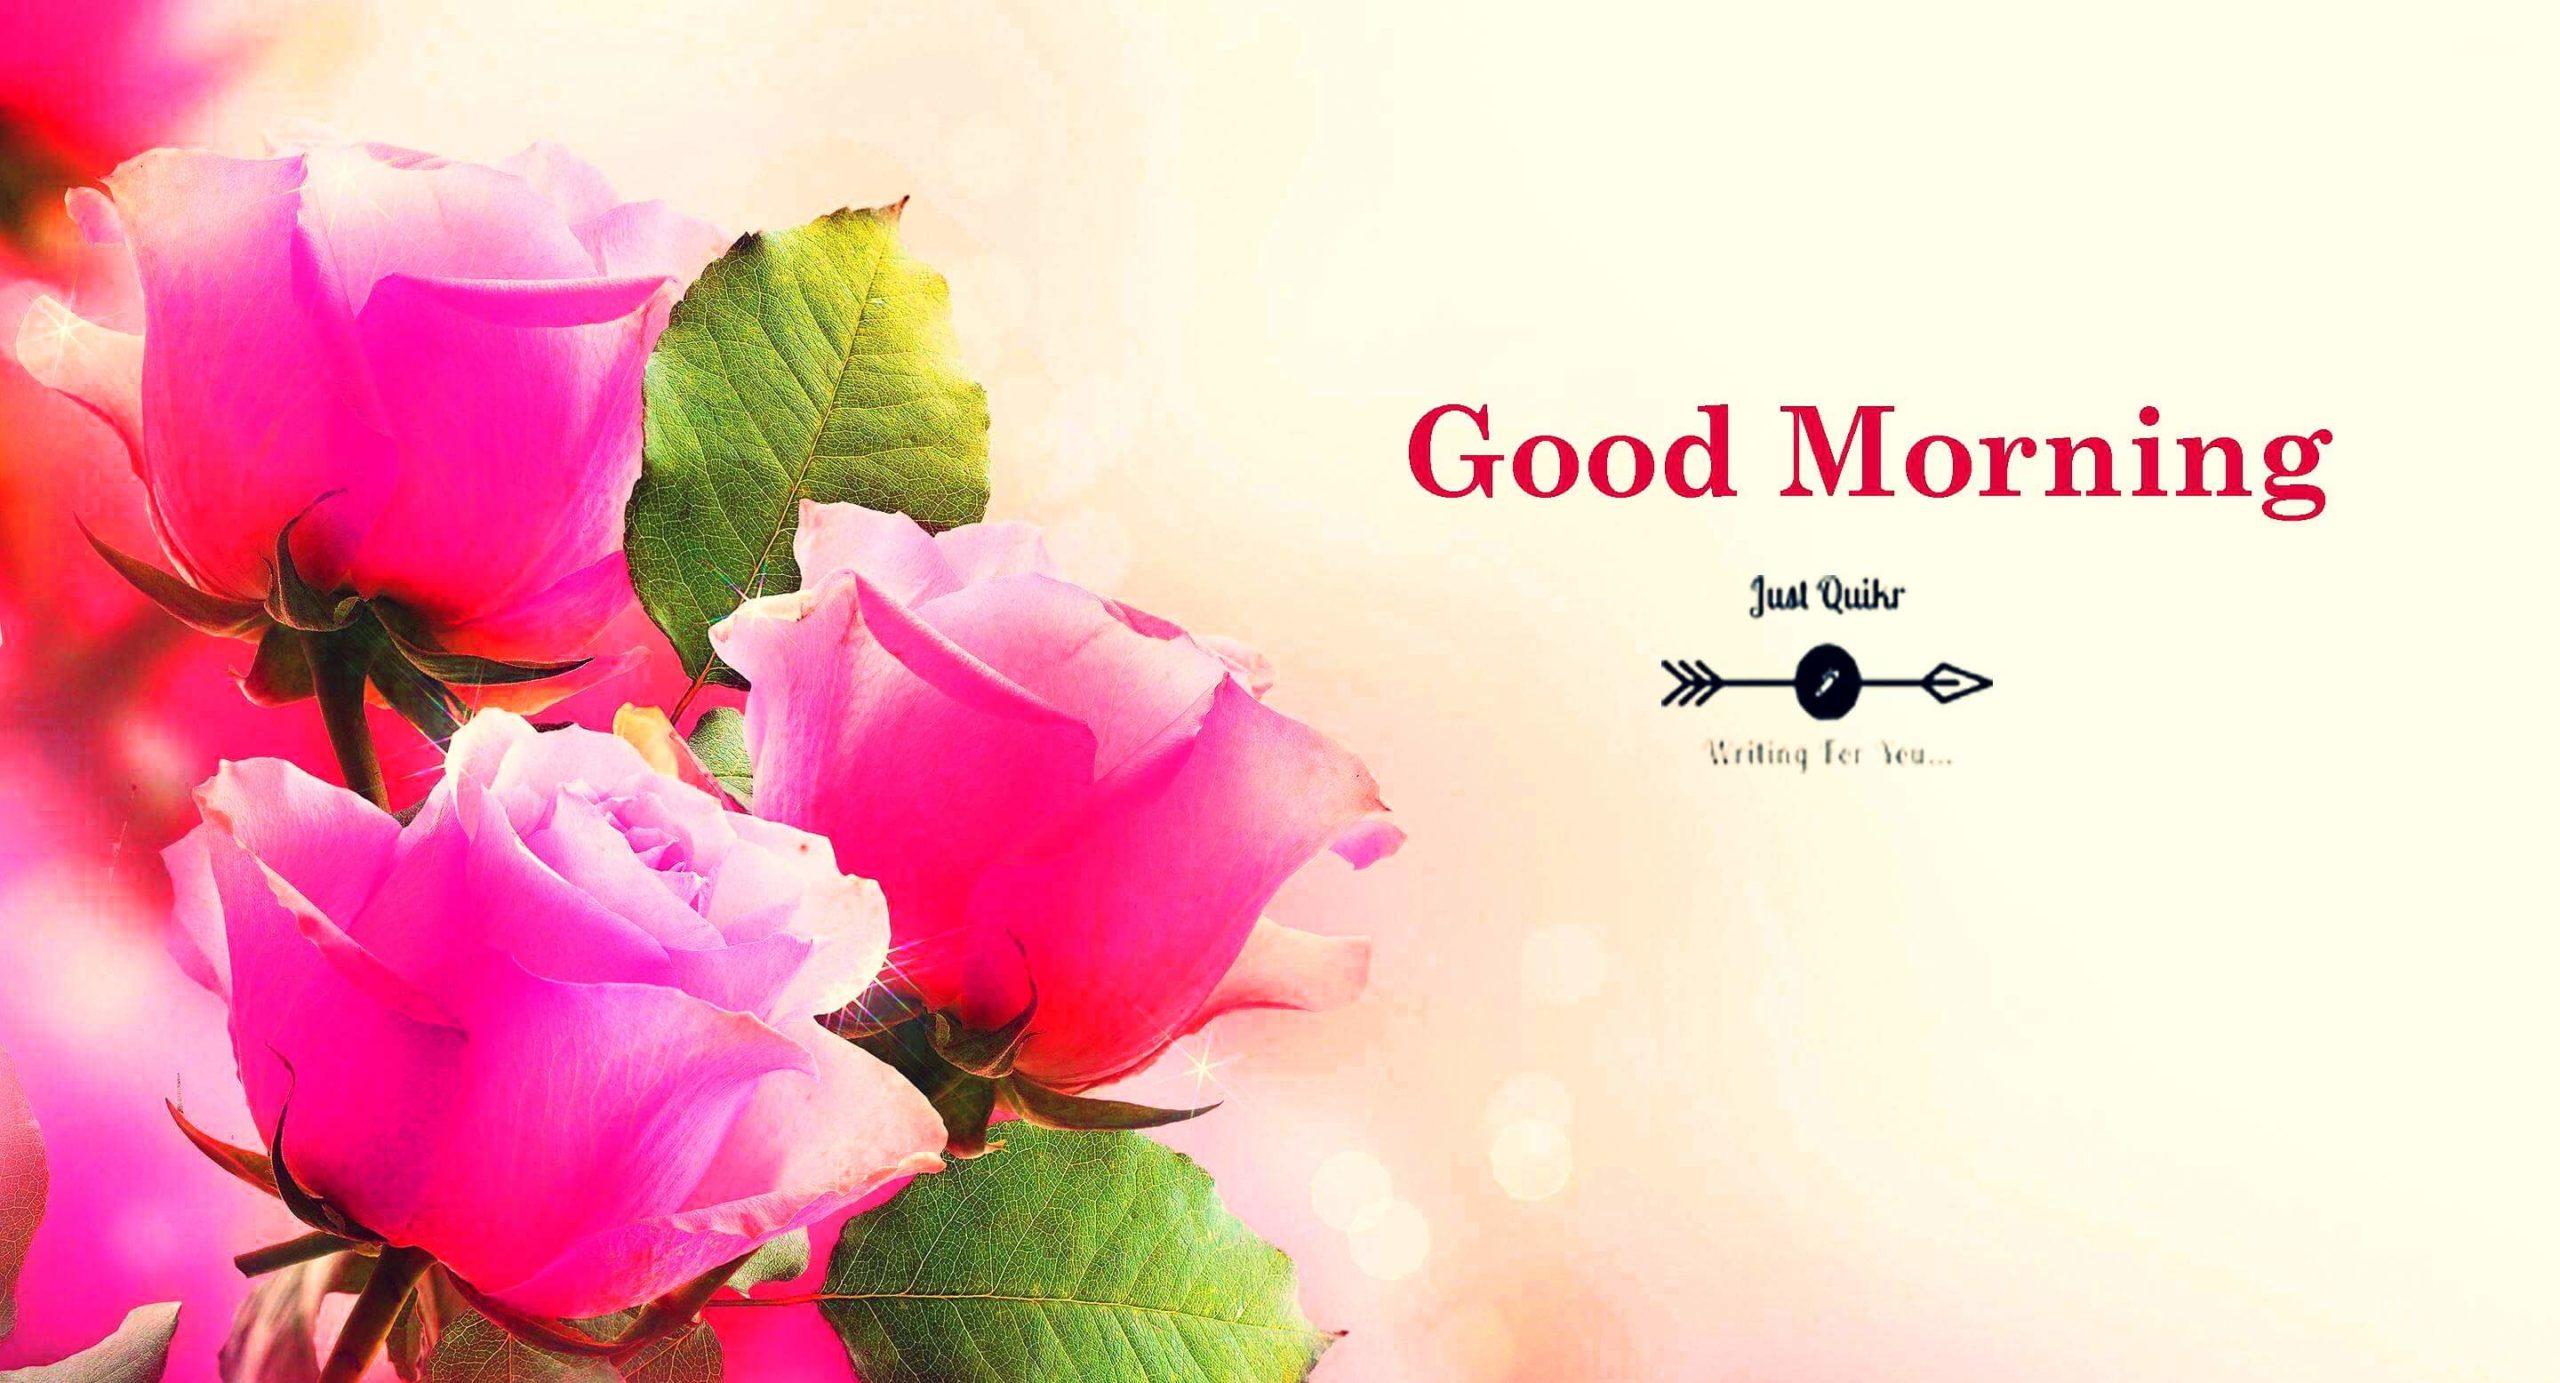 Good Morning Beautiful Flowers HD Pics Images Photo Wallpaper